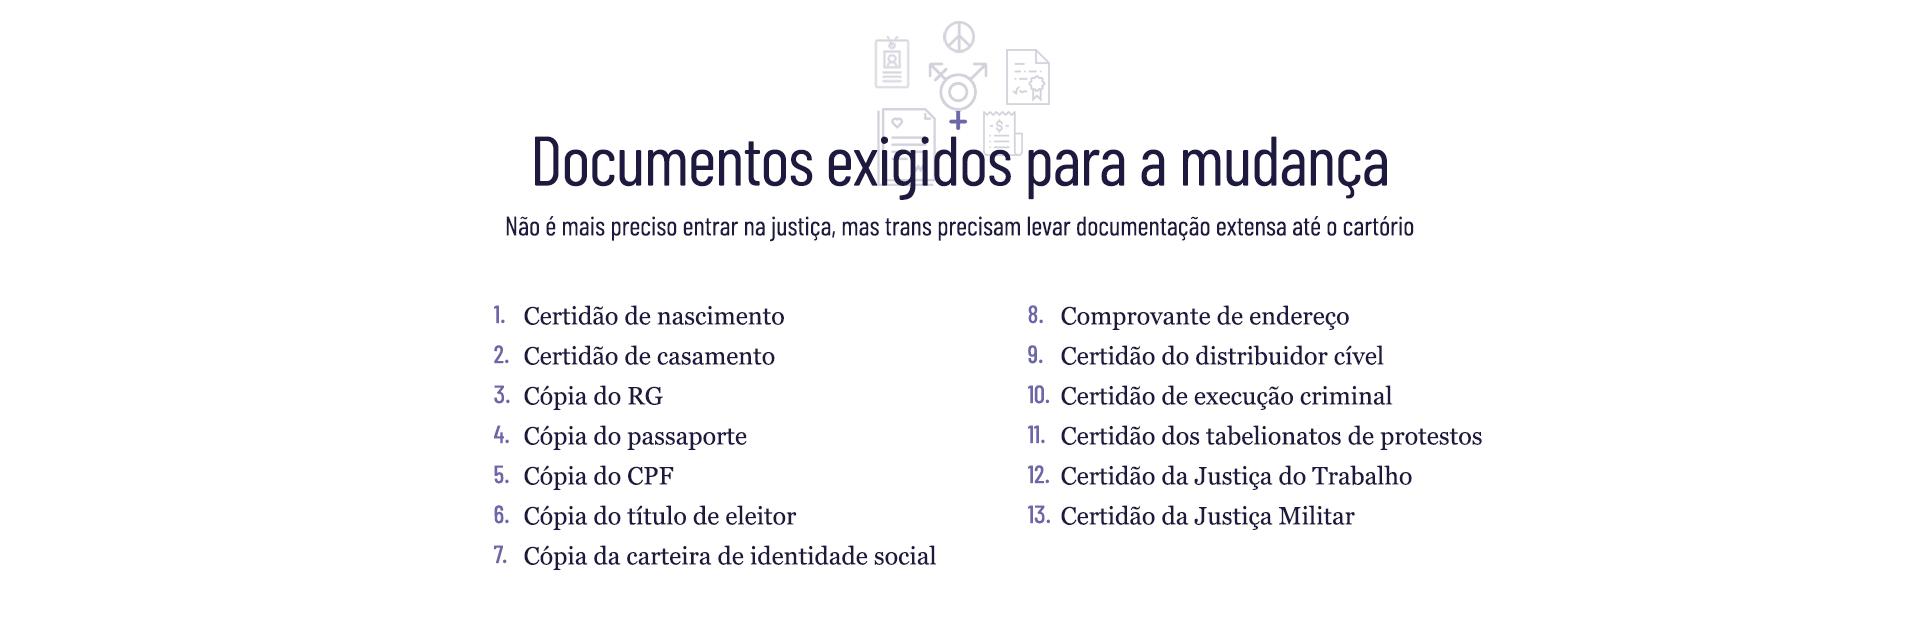 Lucas Seixas/UOL